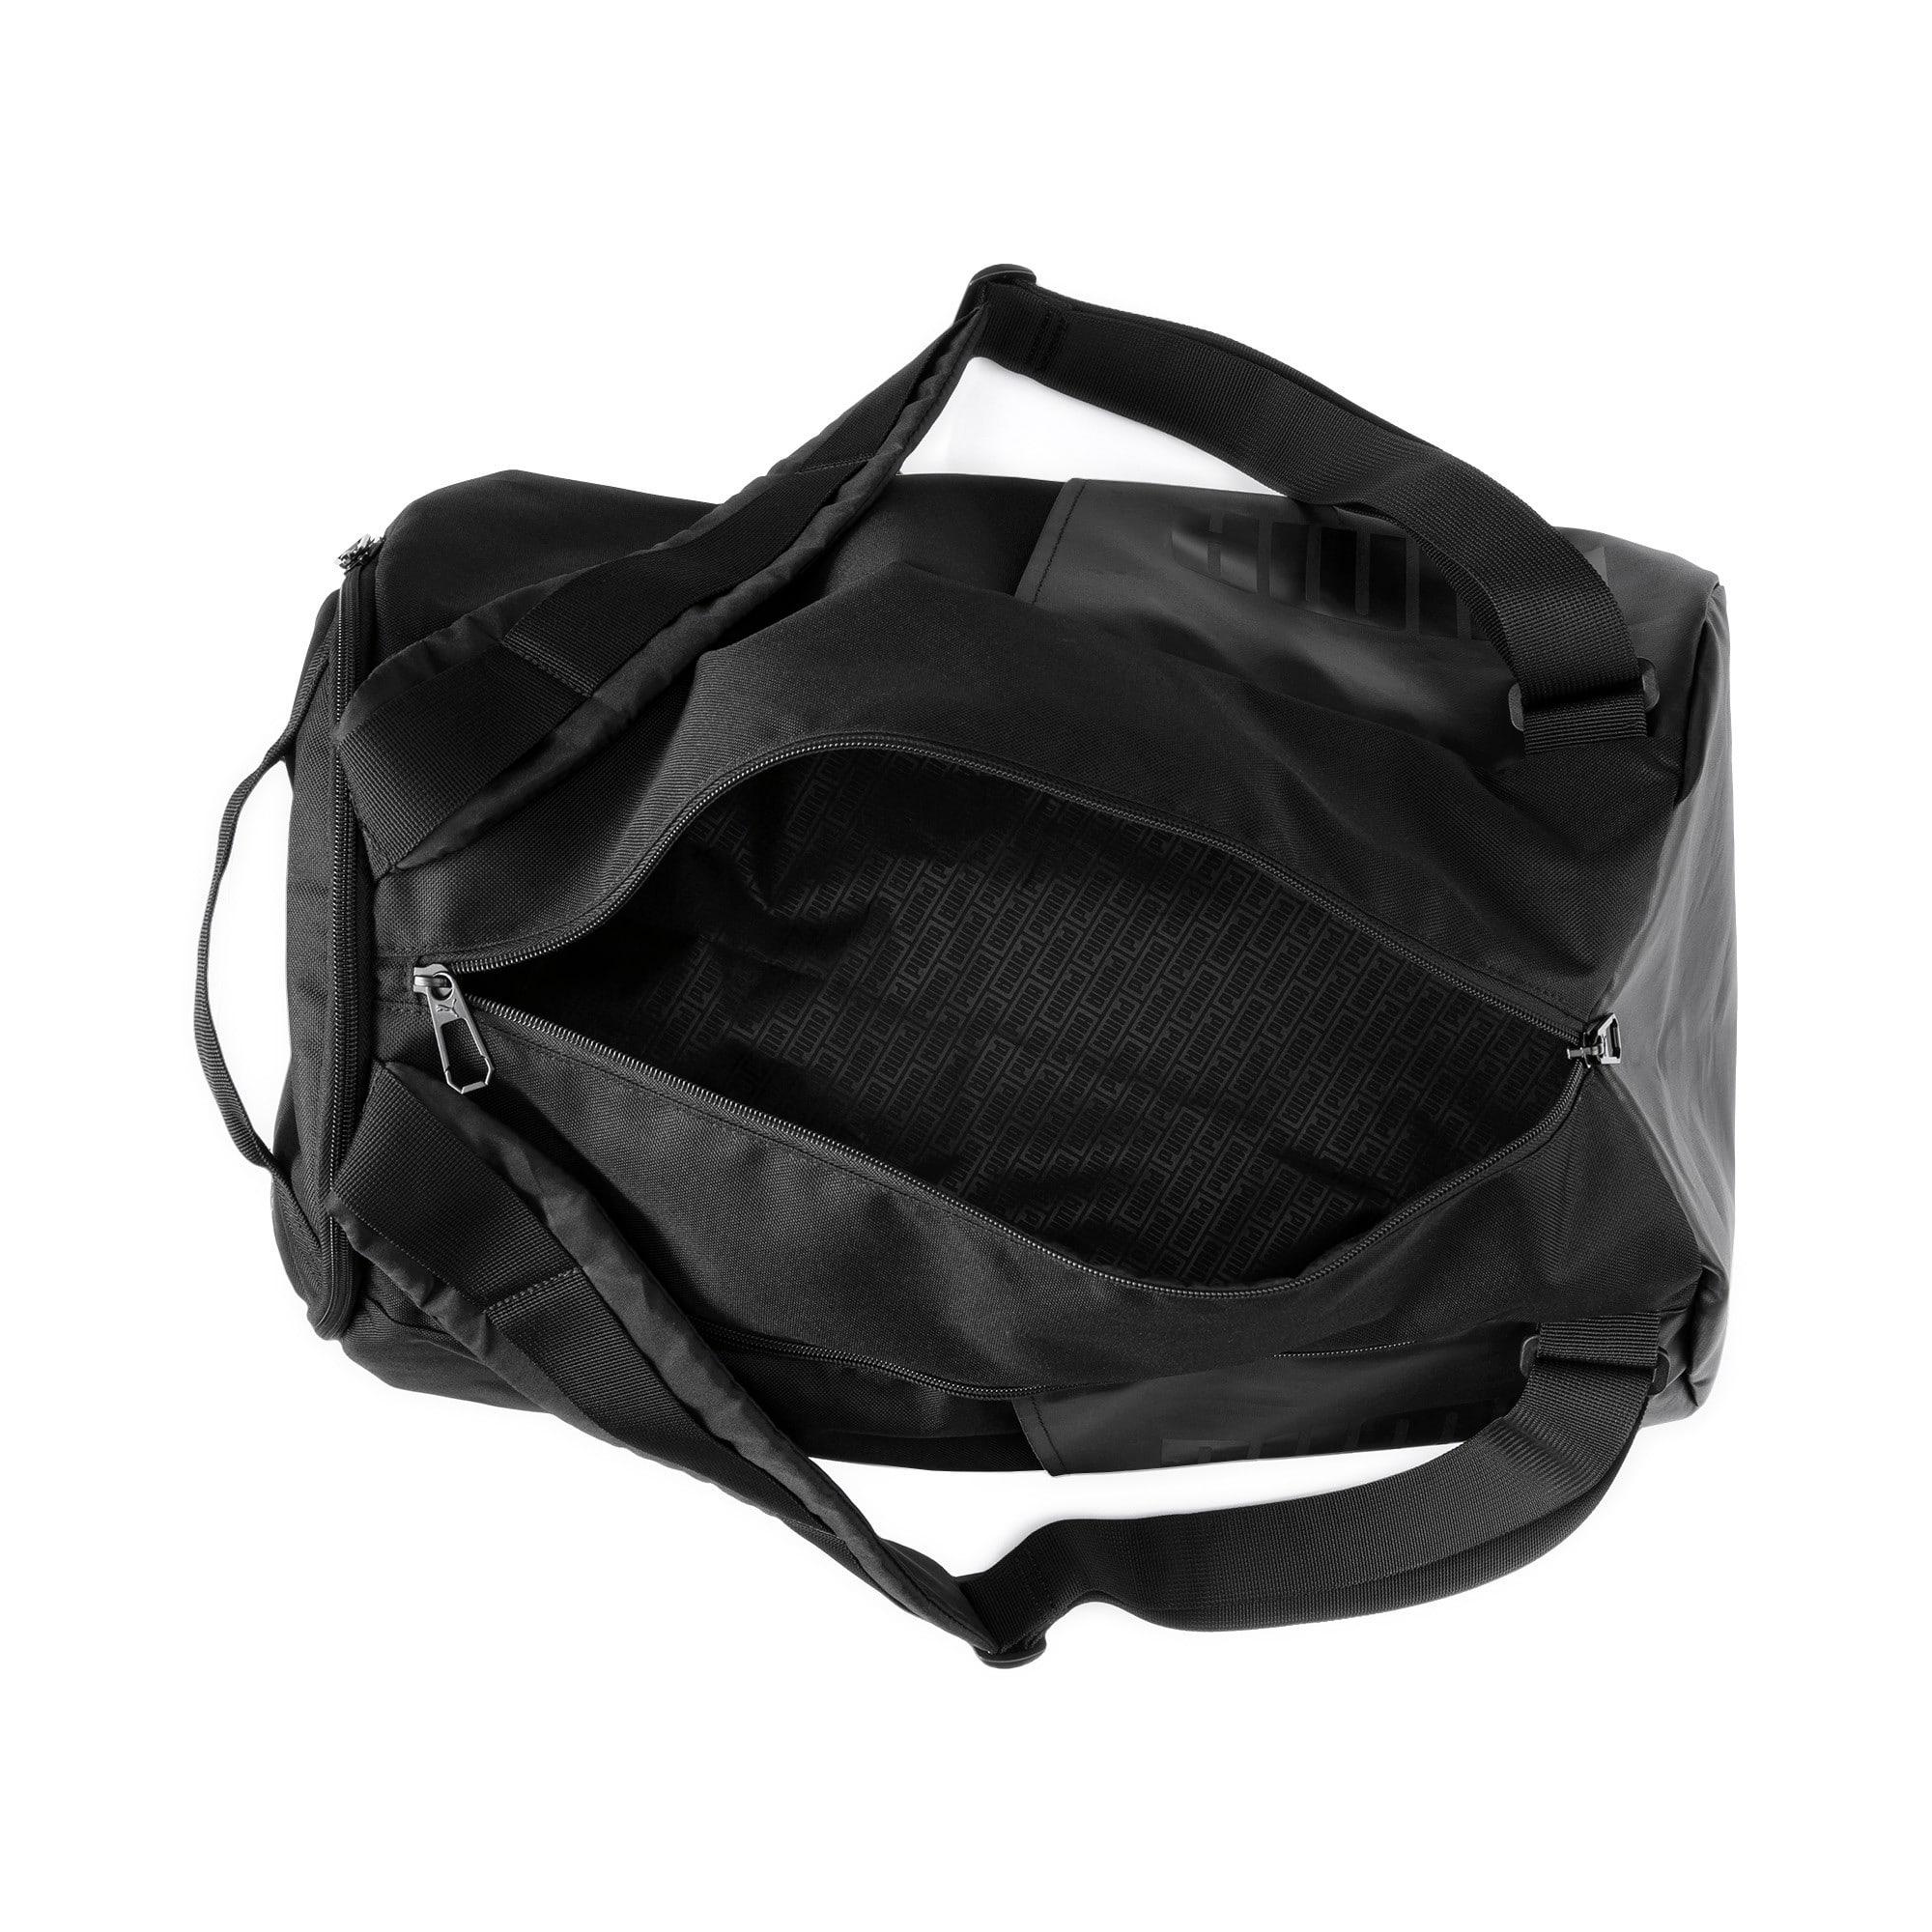 Thumbnail 6 of Training Transform Duffle Bag, Puma Black, medium-IND